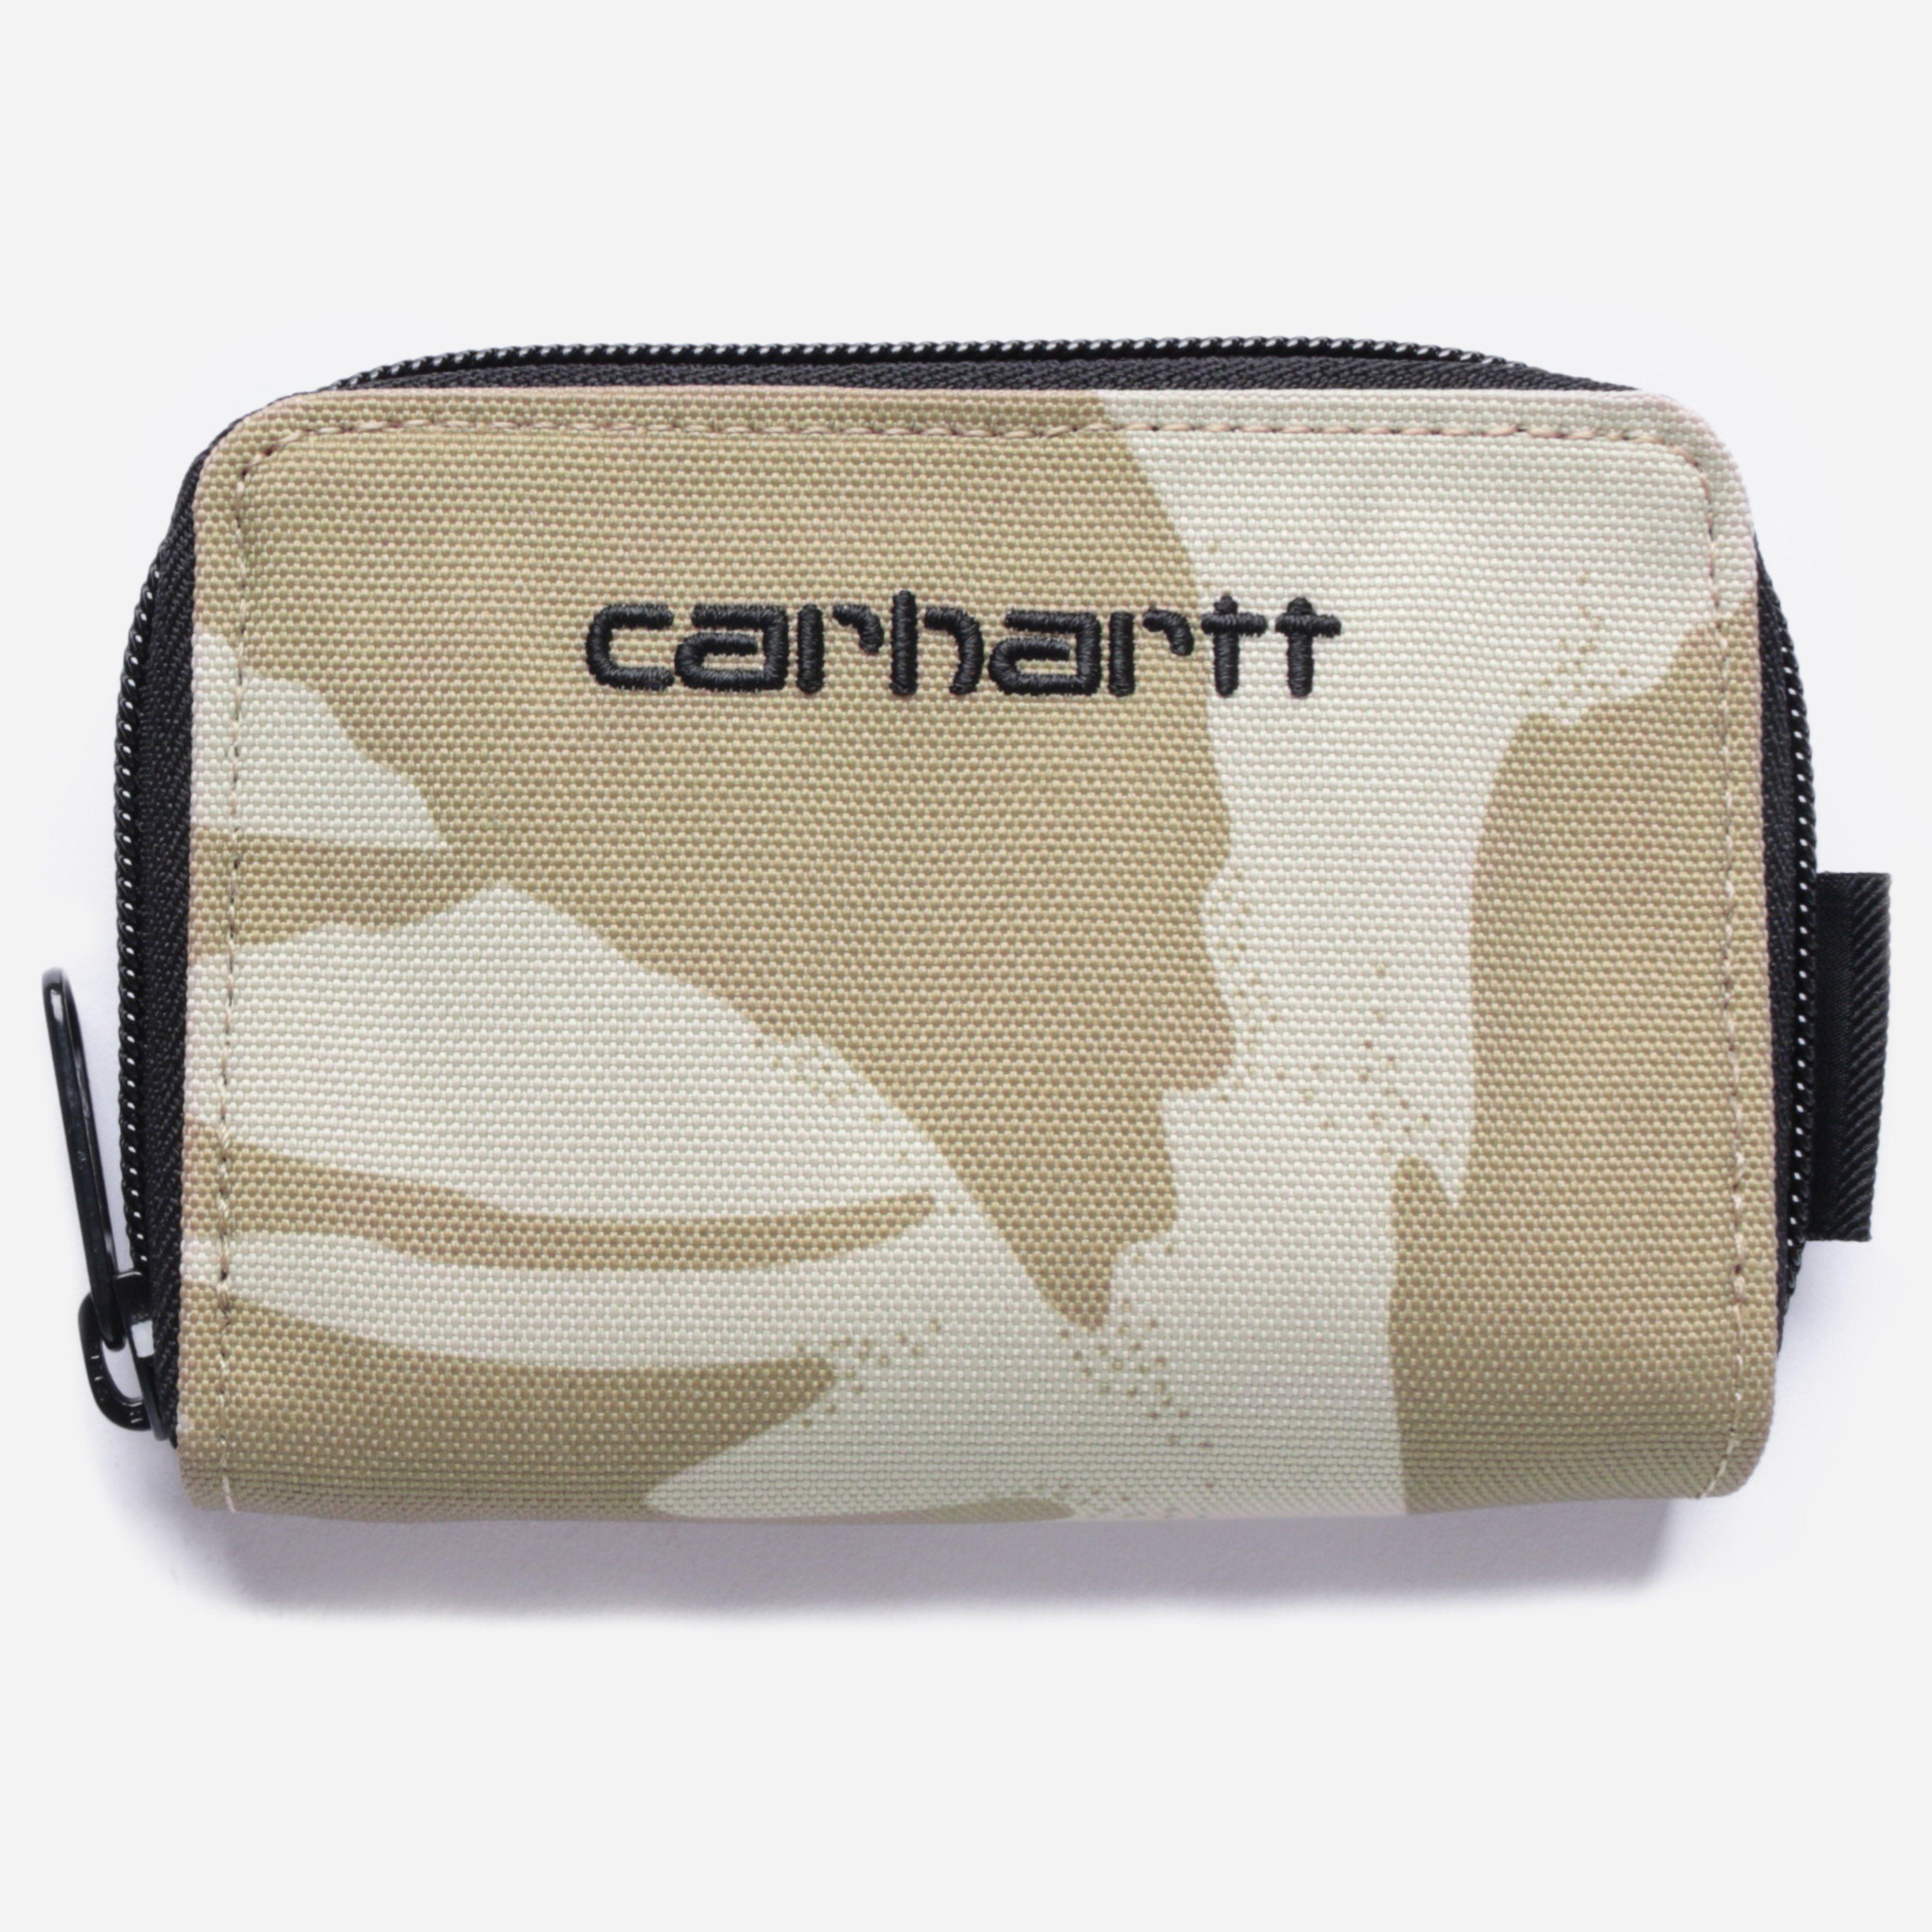 Carhartt WIP I026182 PAYTON MIDI WALLET